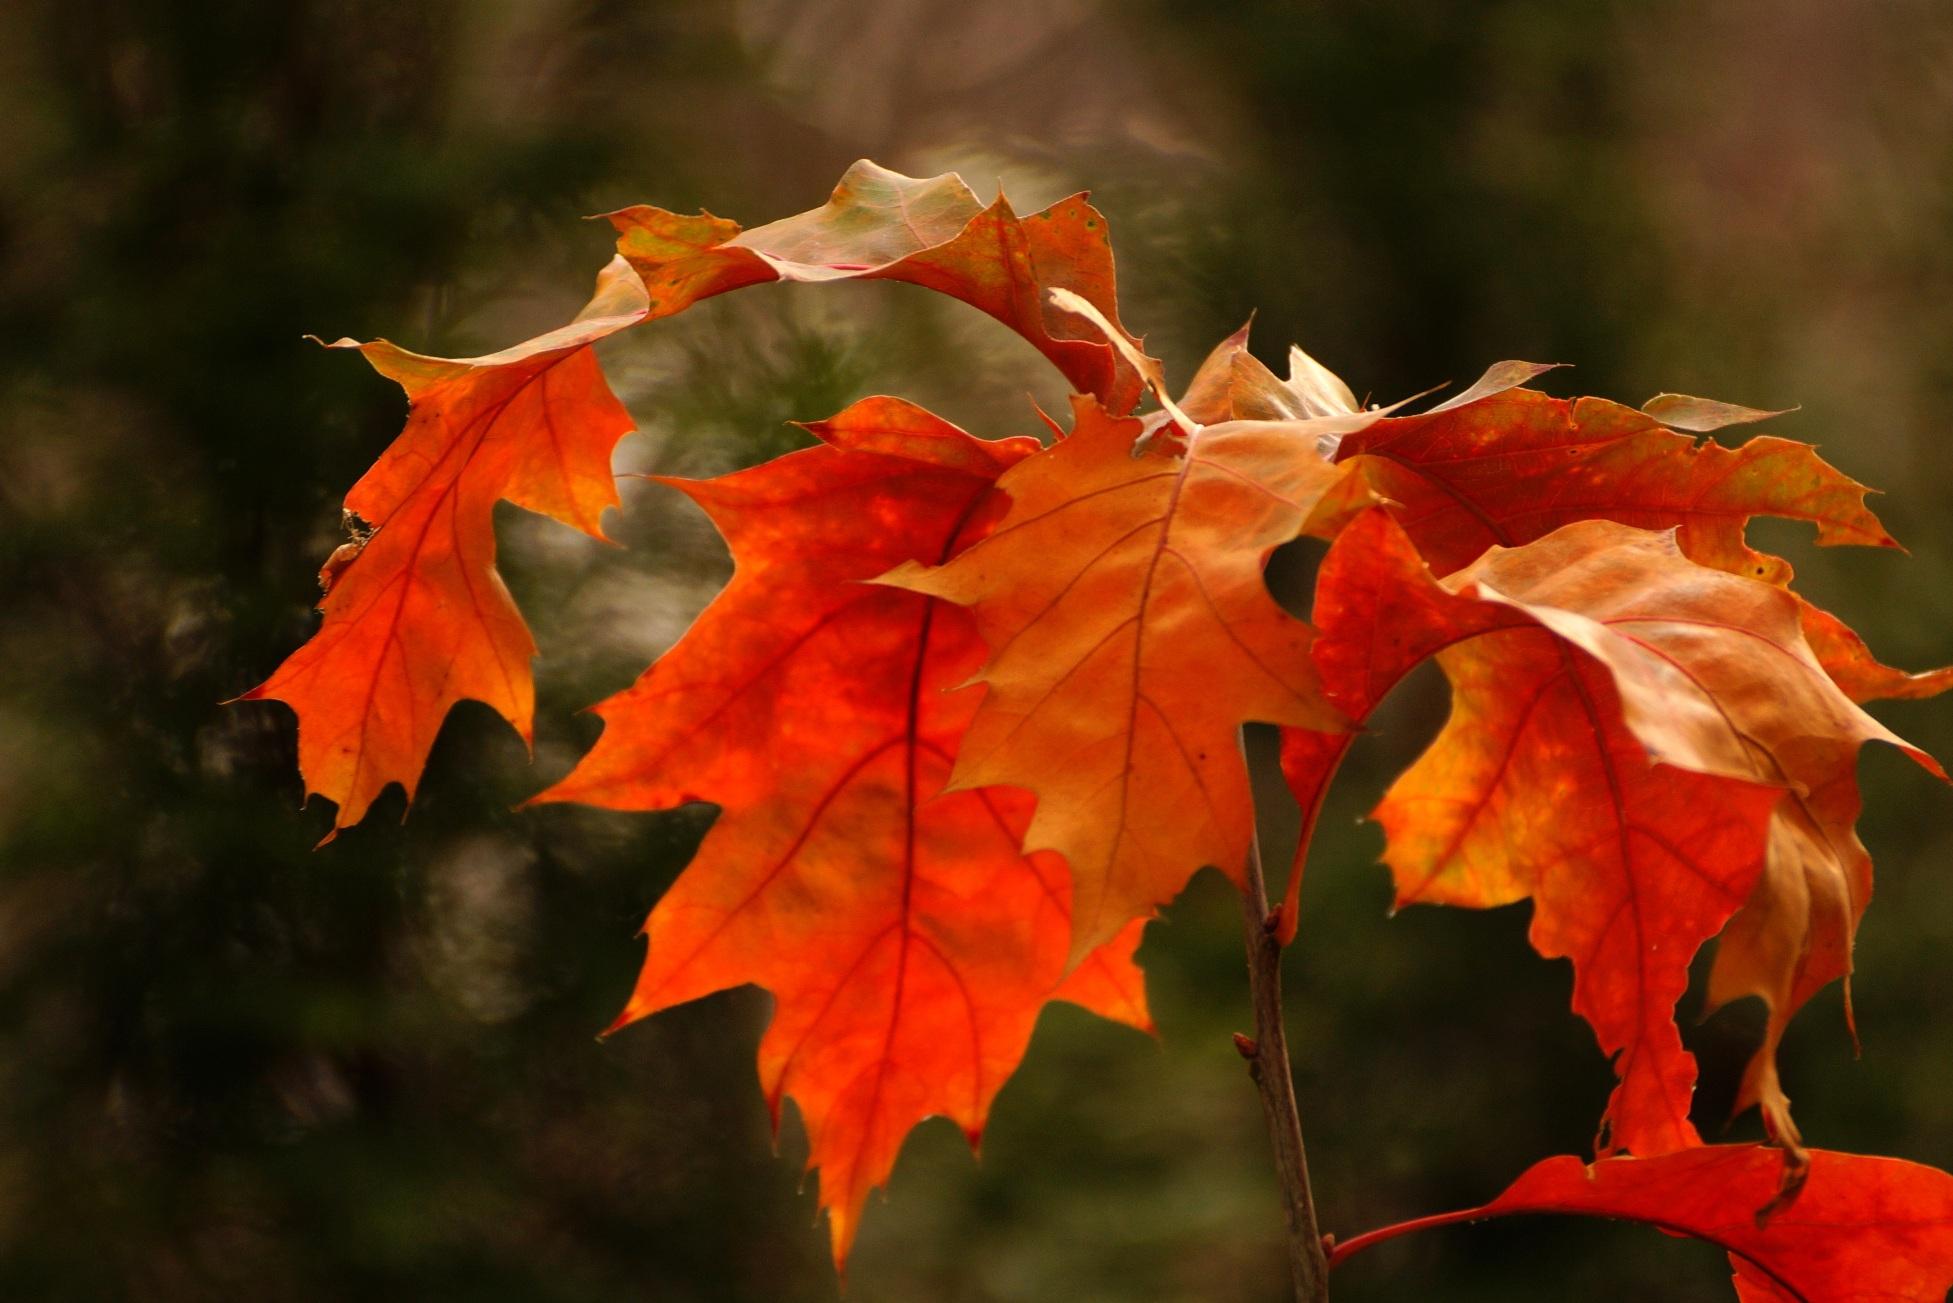 Quercus rubra, Quercus borealis – dąb czerwony, dąb amerykański